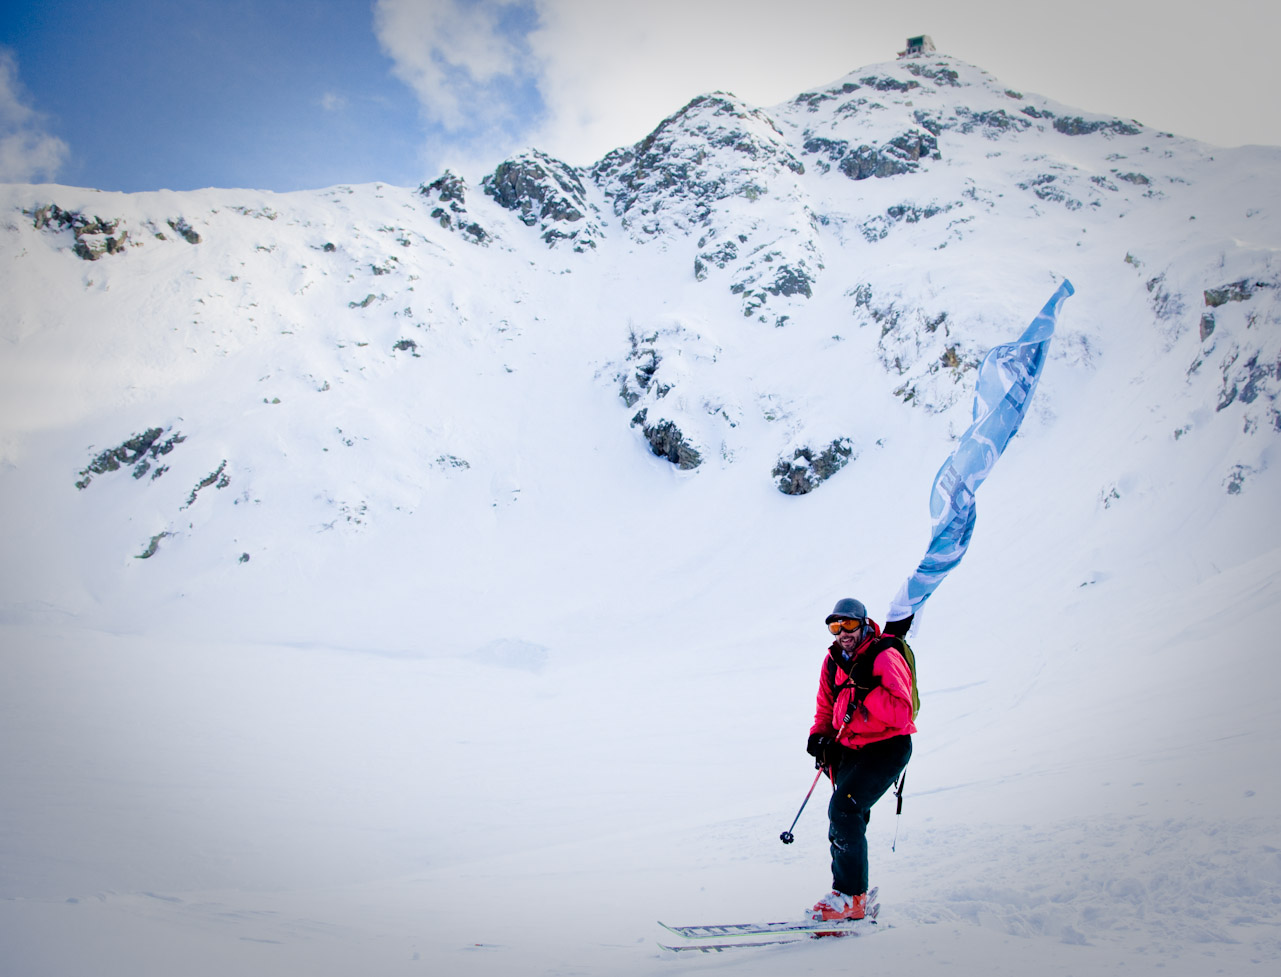 Valle Oropa, Monte Mucrone, versante nord: discesa dall'anticima Freeride_limbo_6